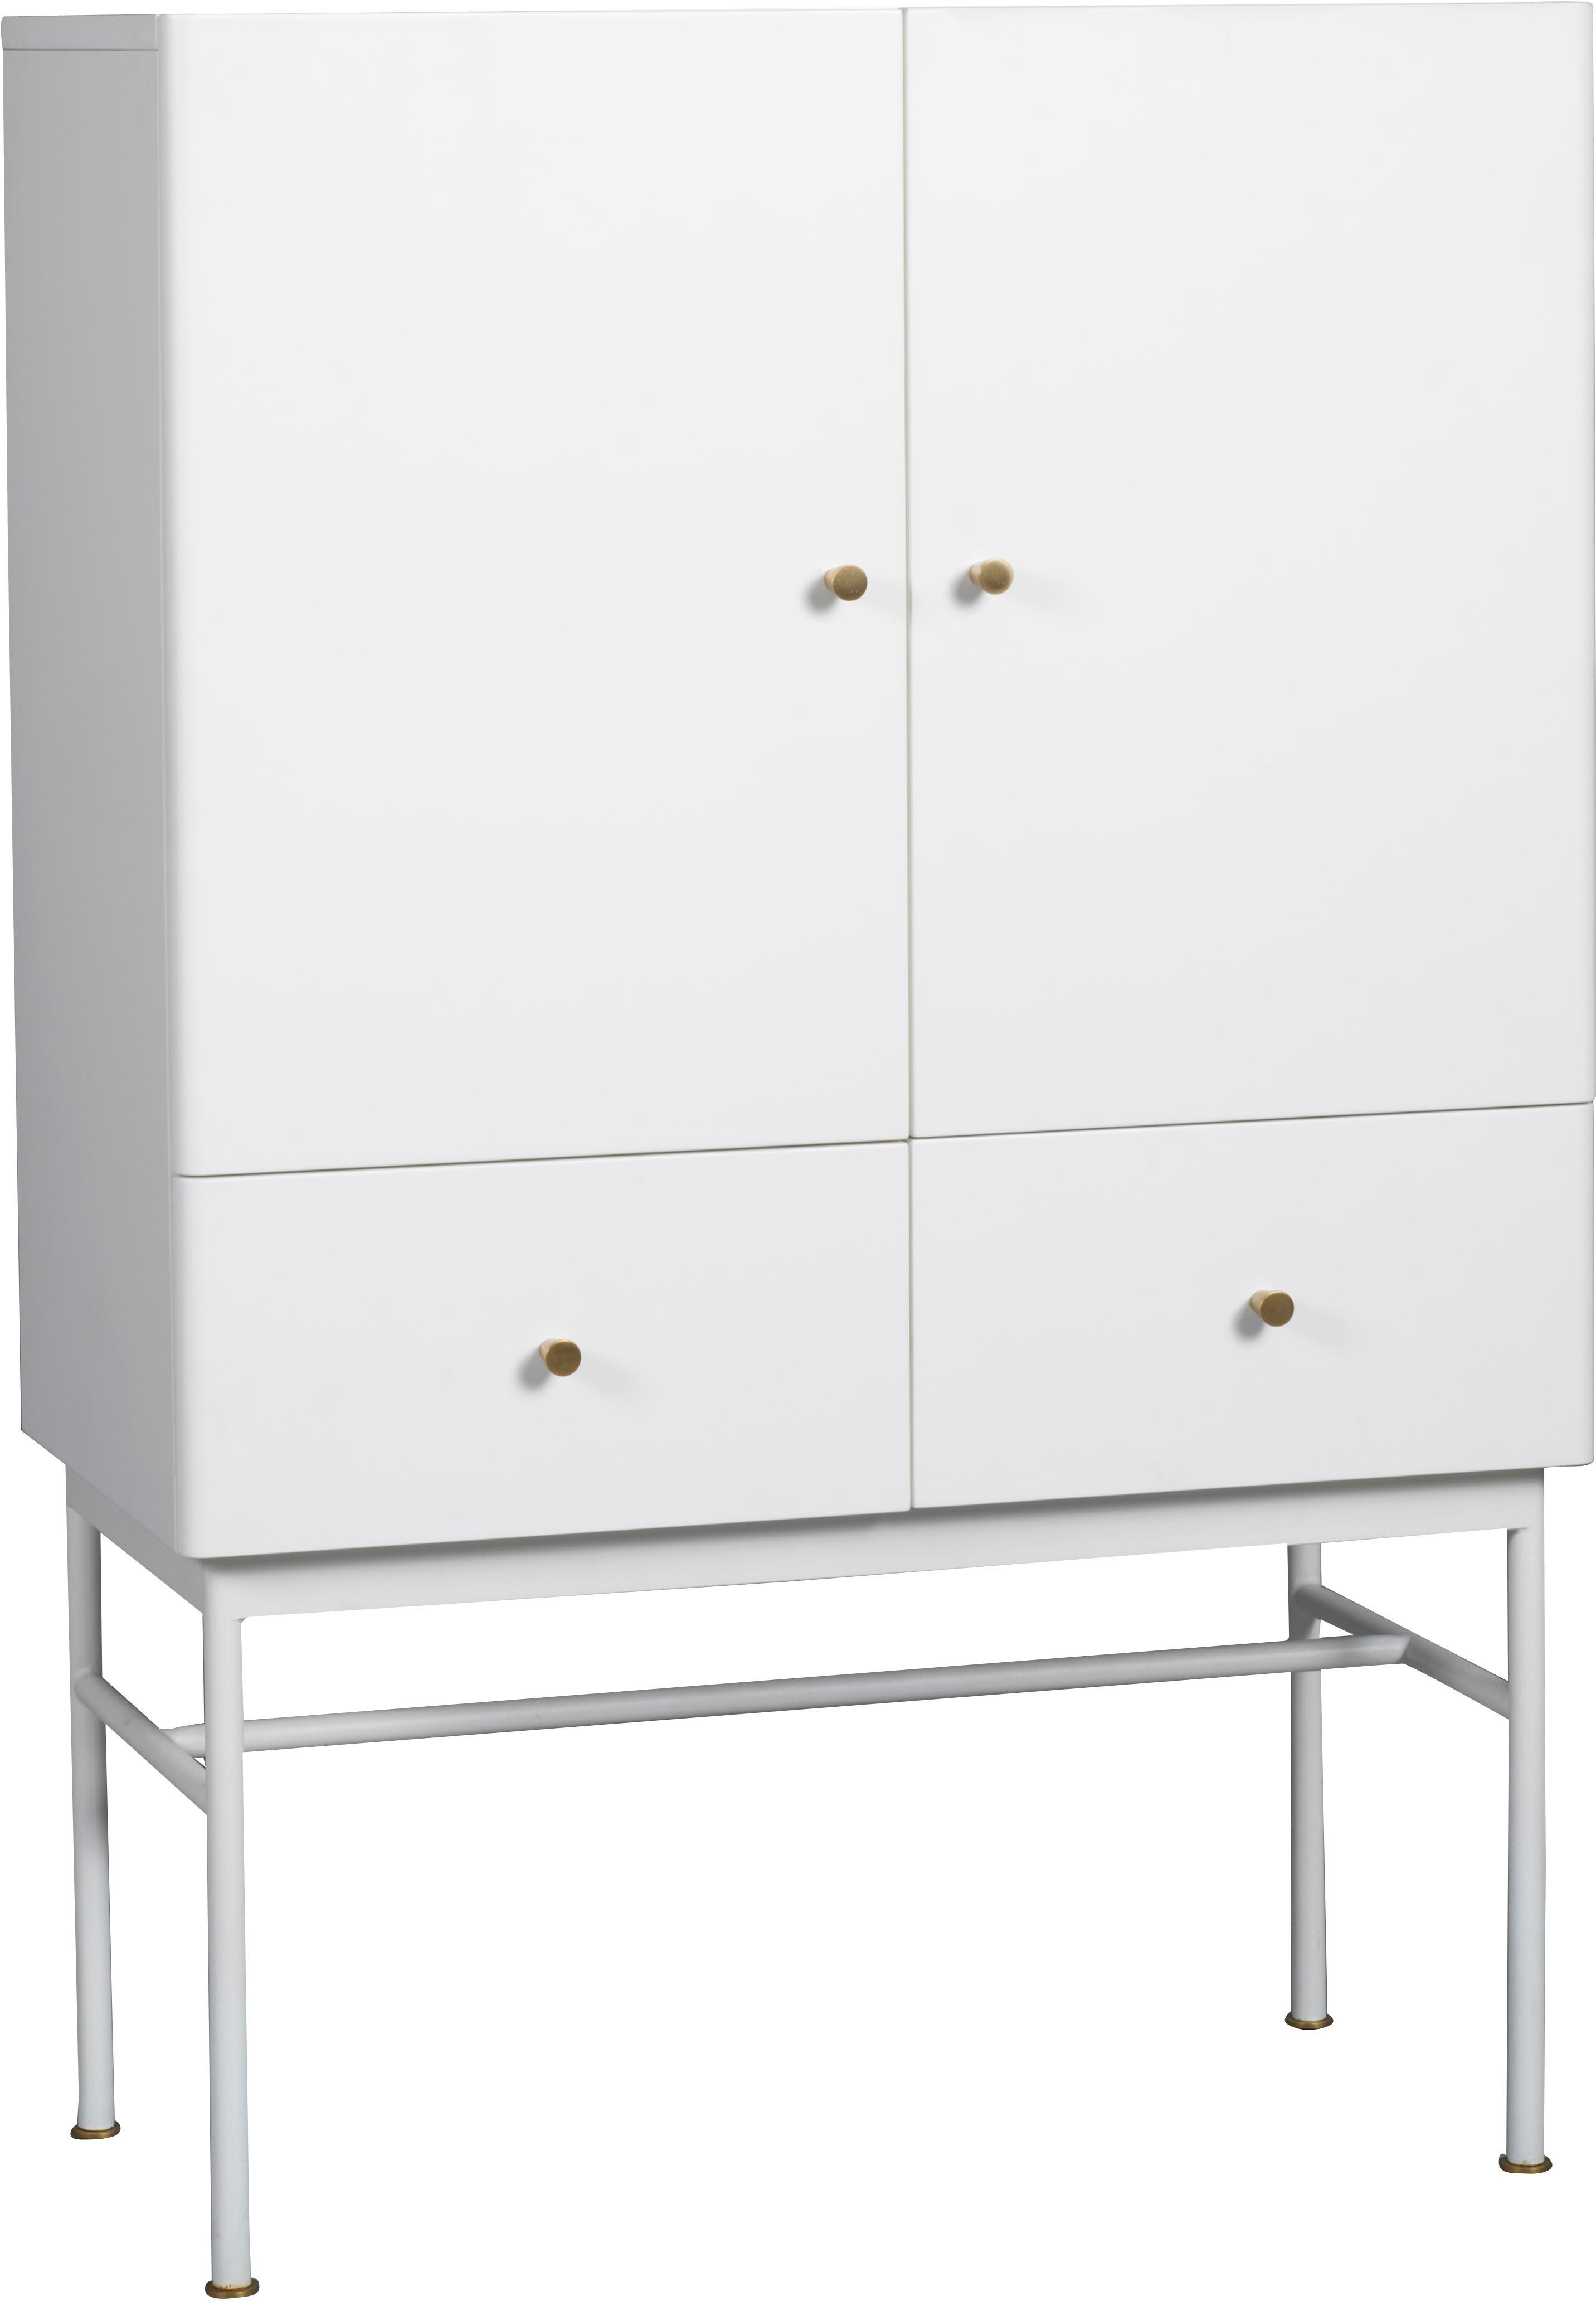 Witte dressoir Glendale met lades en deuren, Frame: gelakt MDF, Eikenhoutkleurig, wit, 80 x 120 cm